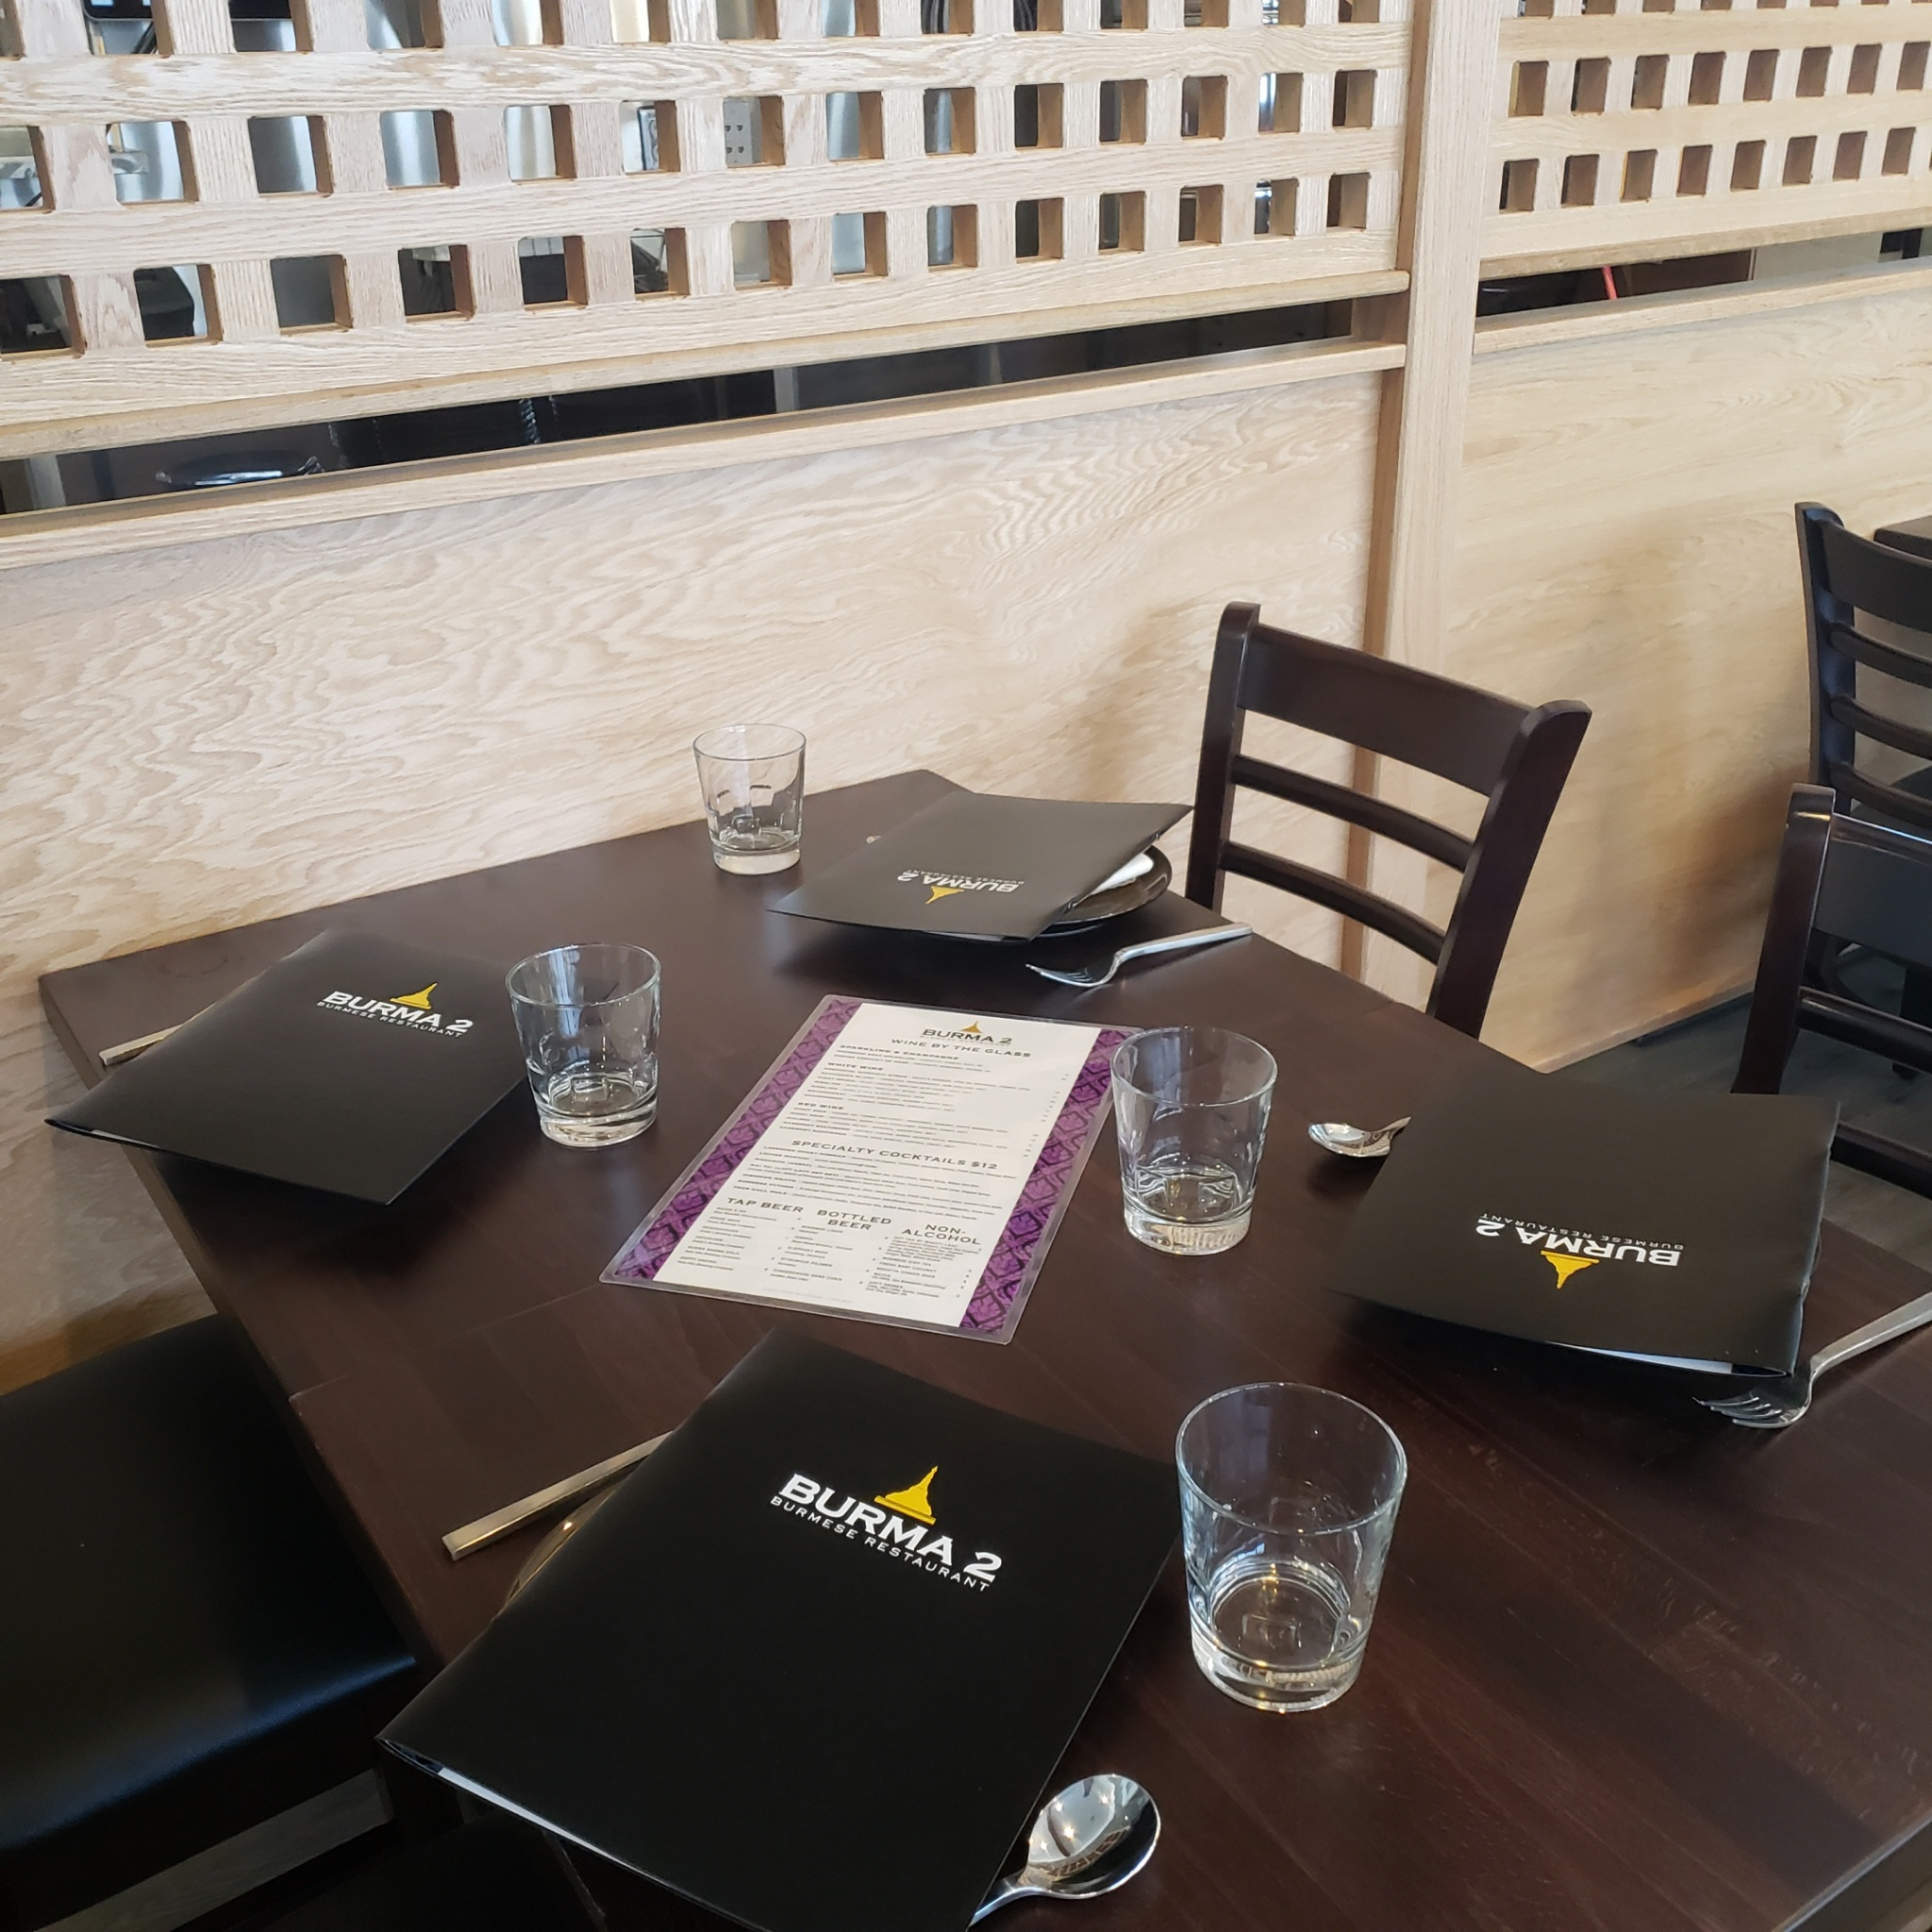 burma 2 table 3.JPG